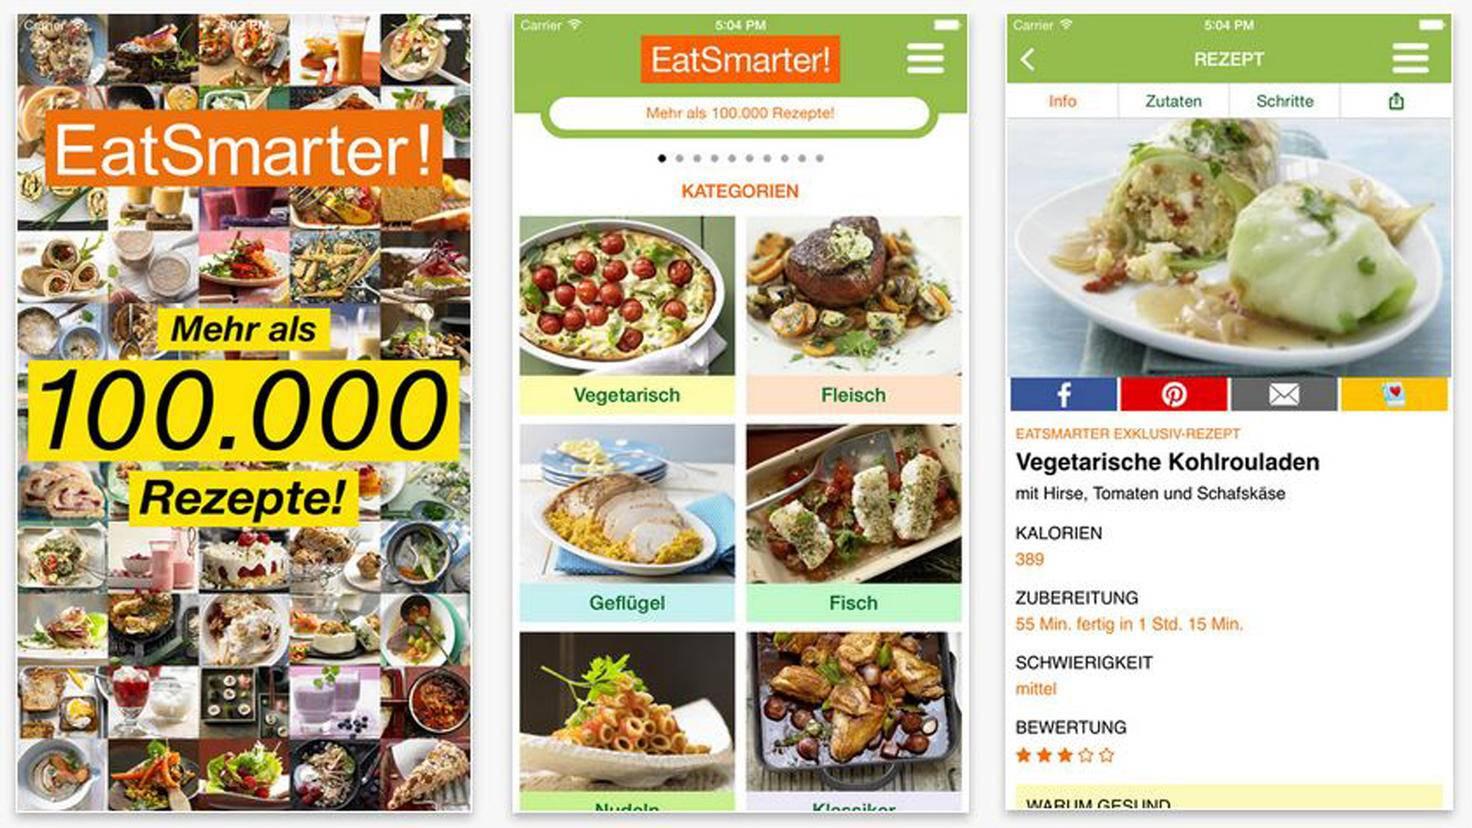 Eat Smarter-iTunes-Eat Smarter GmbH Co KG